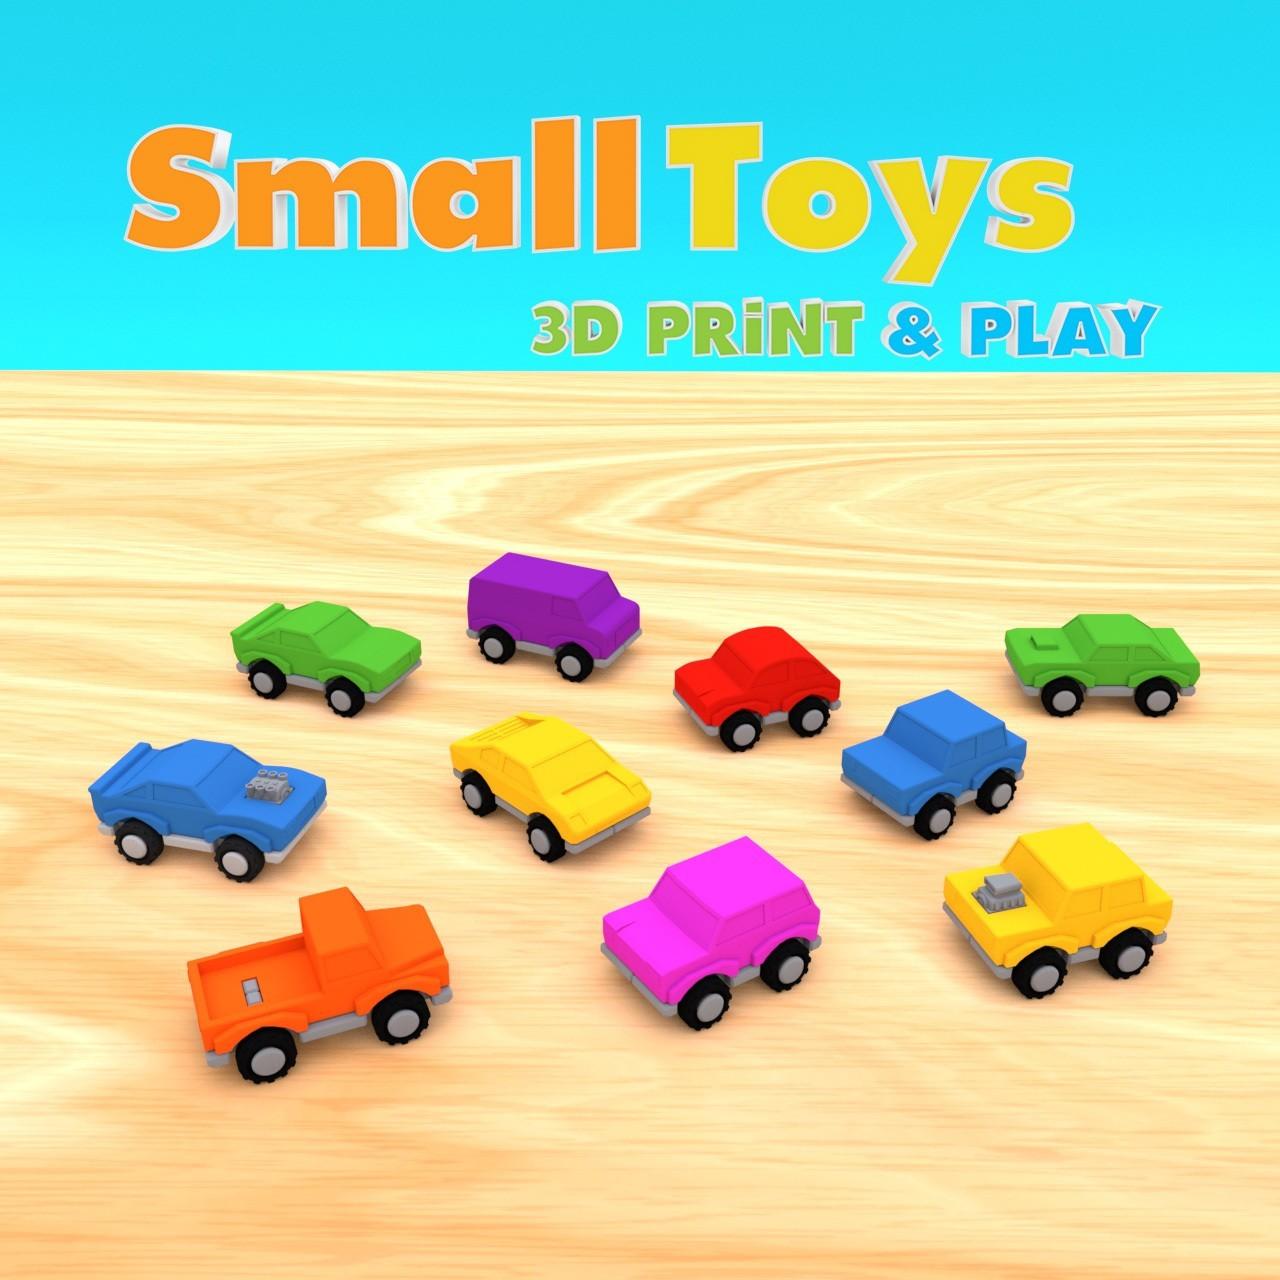 smalltoys-carspack01.jpg Download STL file SmallToys - Cars pack • 3D print design, Wabby